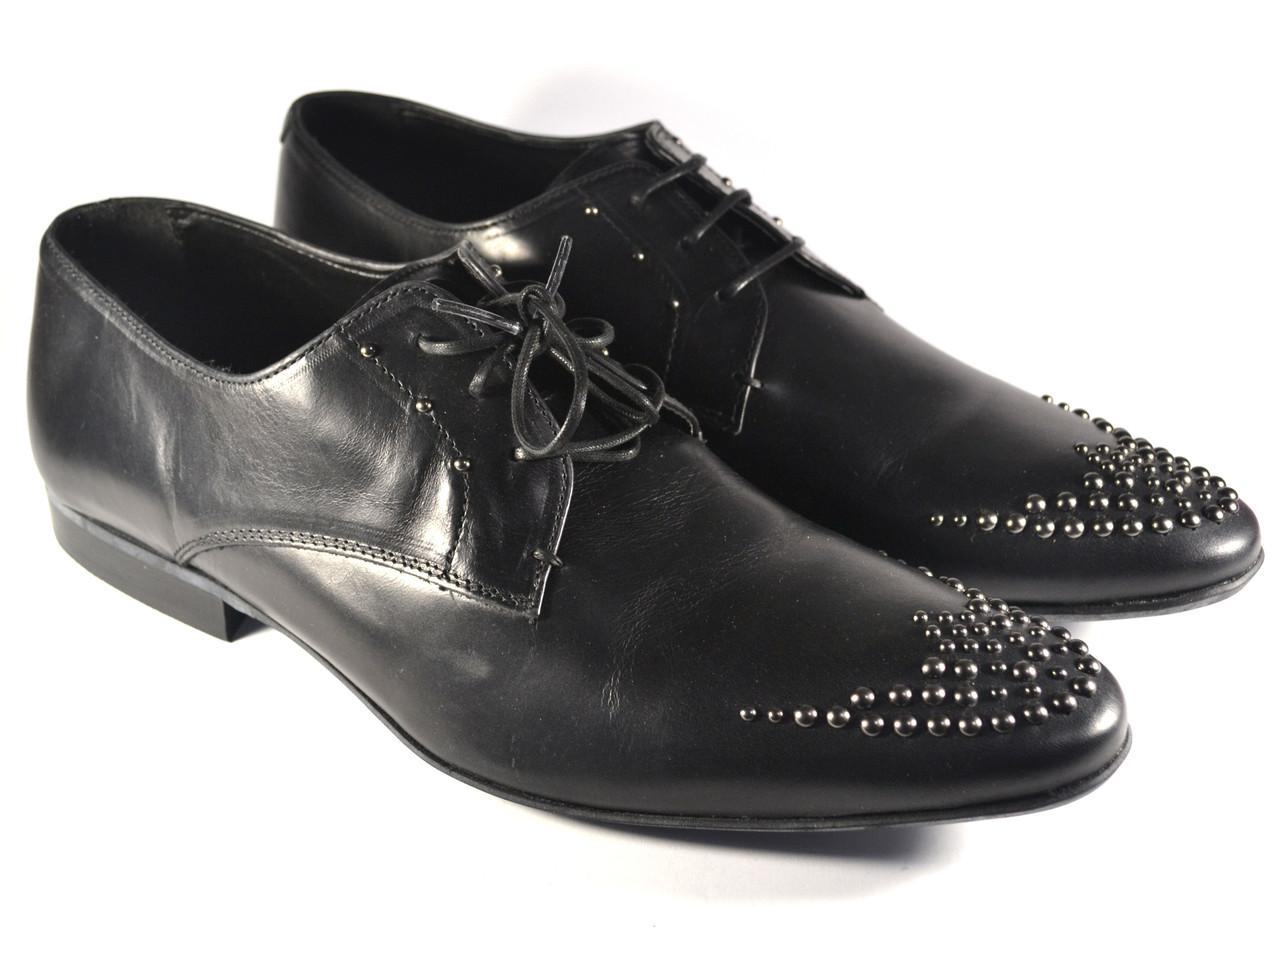 Туфли мужские дерби кожа ASOS Lace Up shoes in Black leather whith Stud оригинал